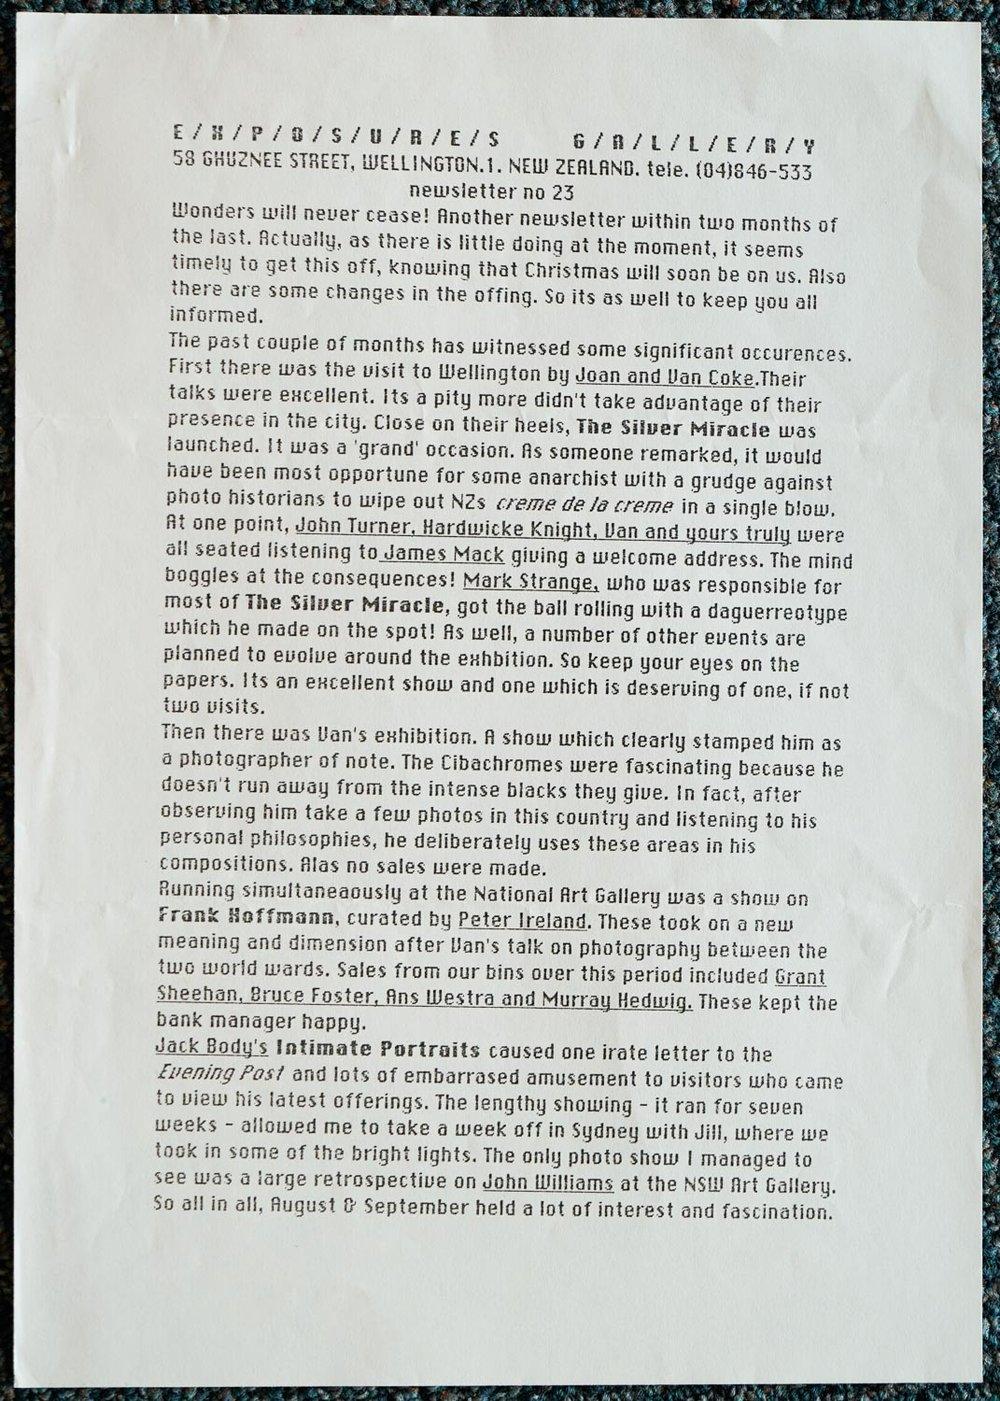 Exposures Gallery Newsletter No.23, August 1989